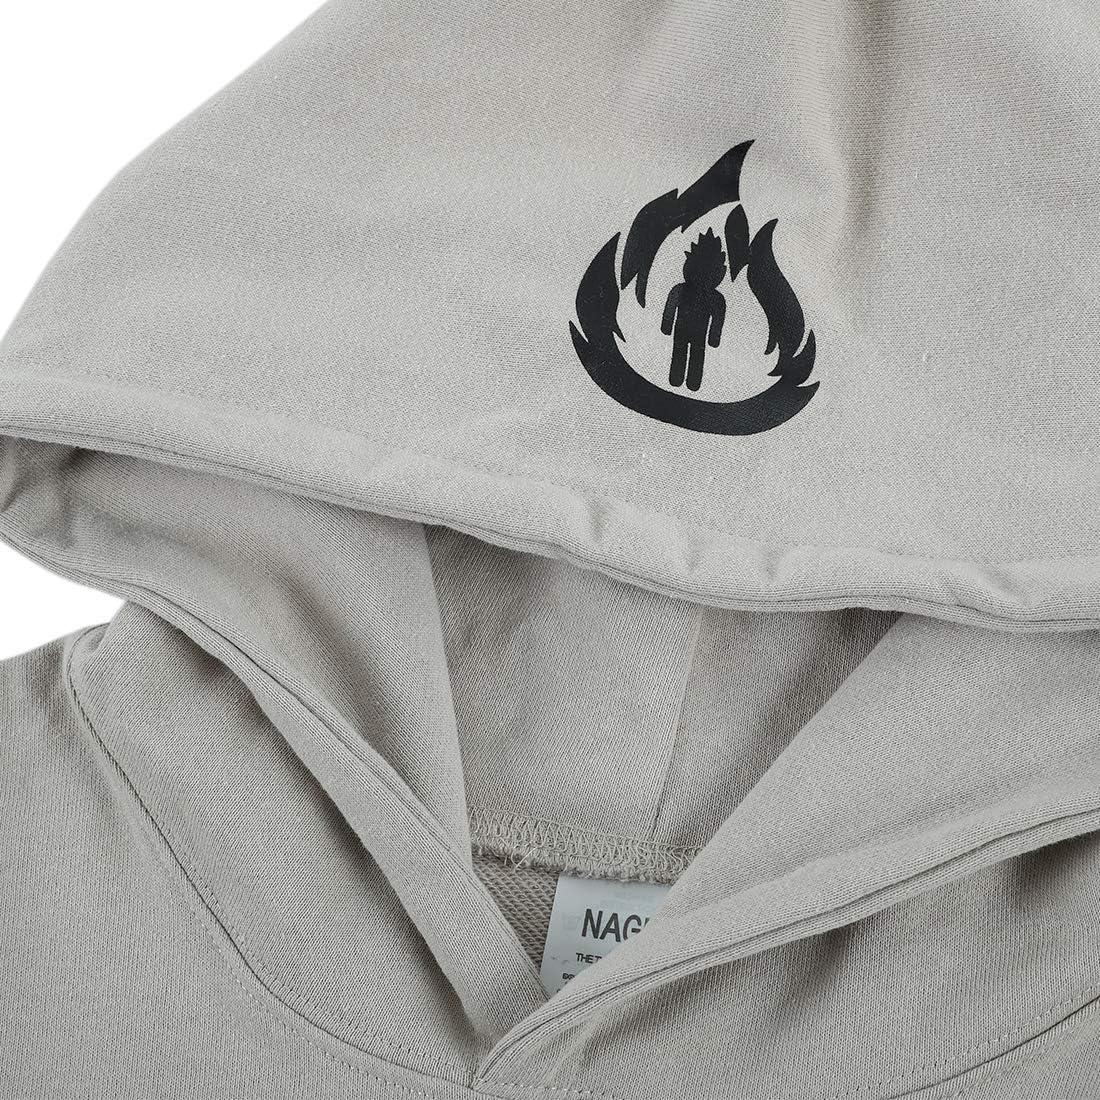 NAGRI Travis Scott Hoodie Sweatshirts Hip Hop Rapper Cotton Black